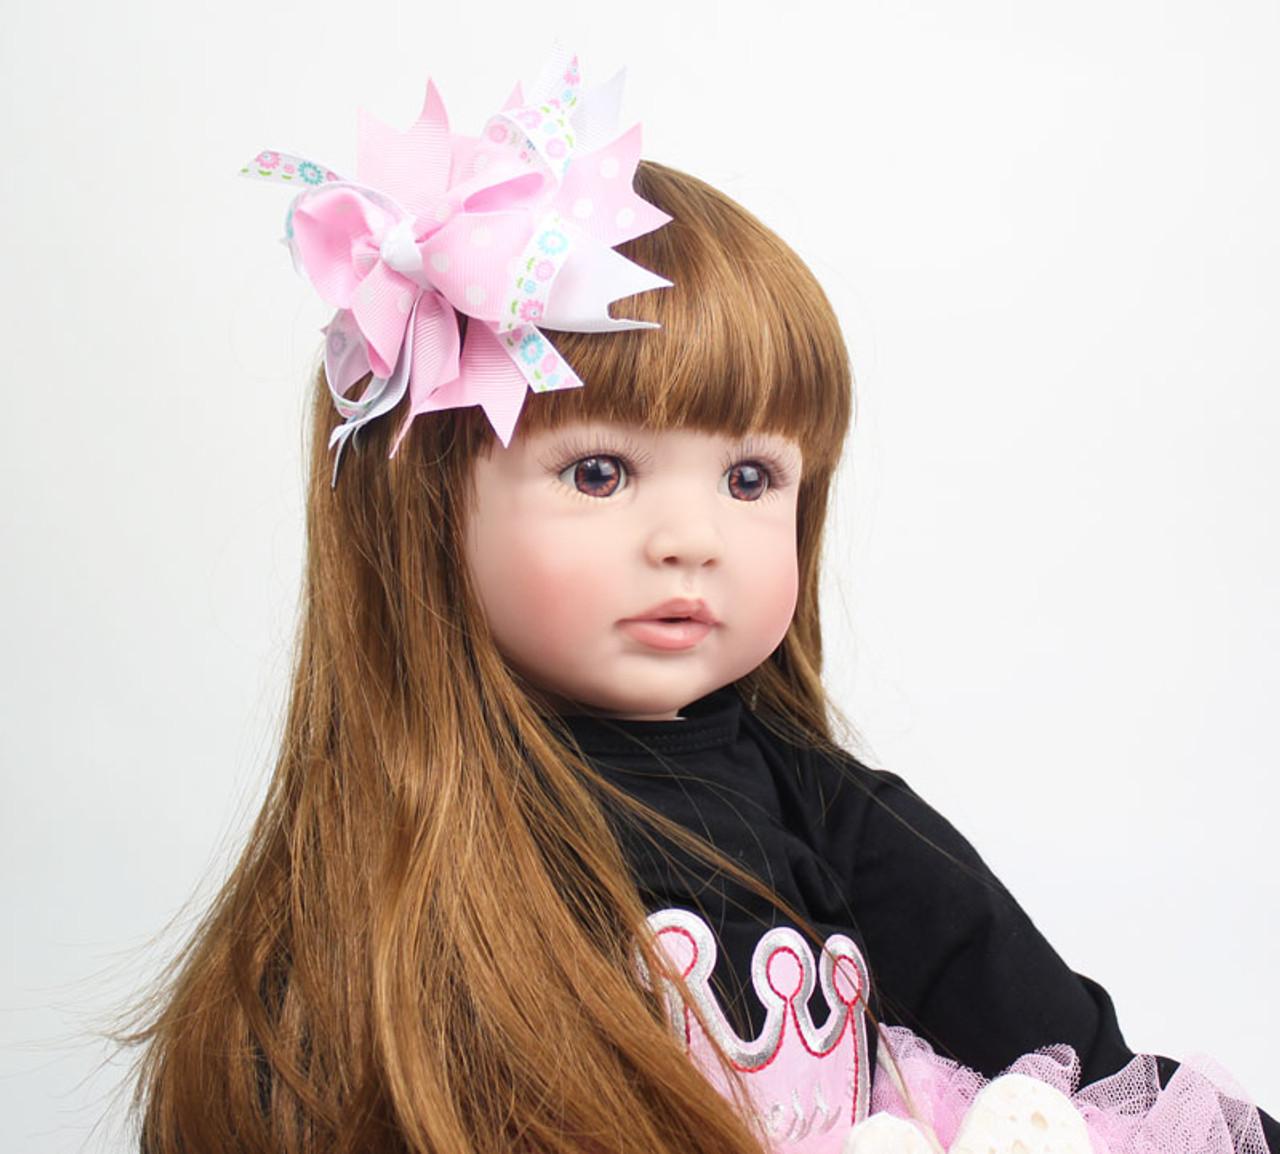 e45212c49 ... 60cm Silicone Reborn Baby Doll Toys 24 inch Vinyl Princess Toddler  Babies Dolls Girls Birthday Gift ...